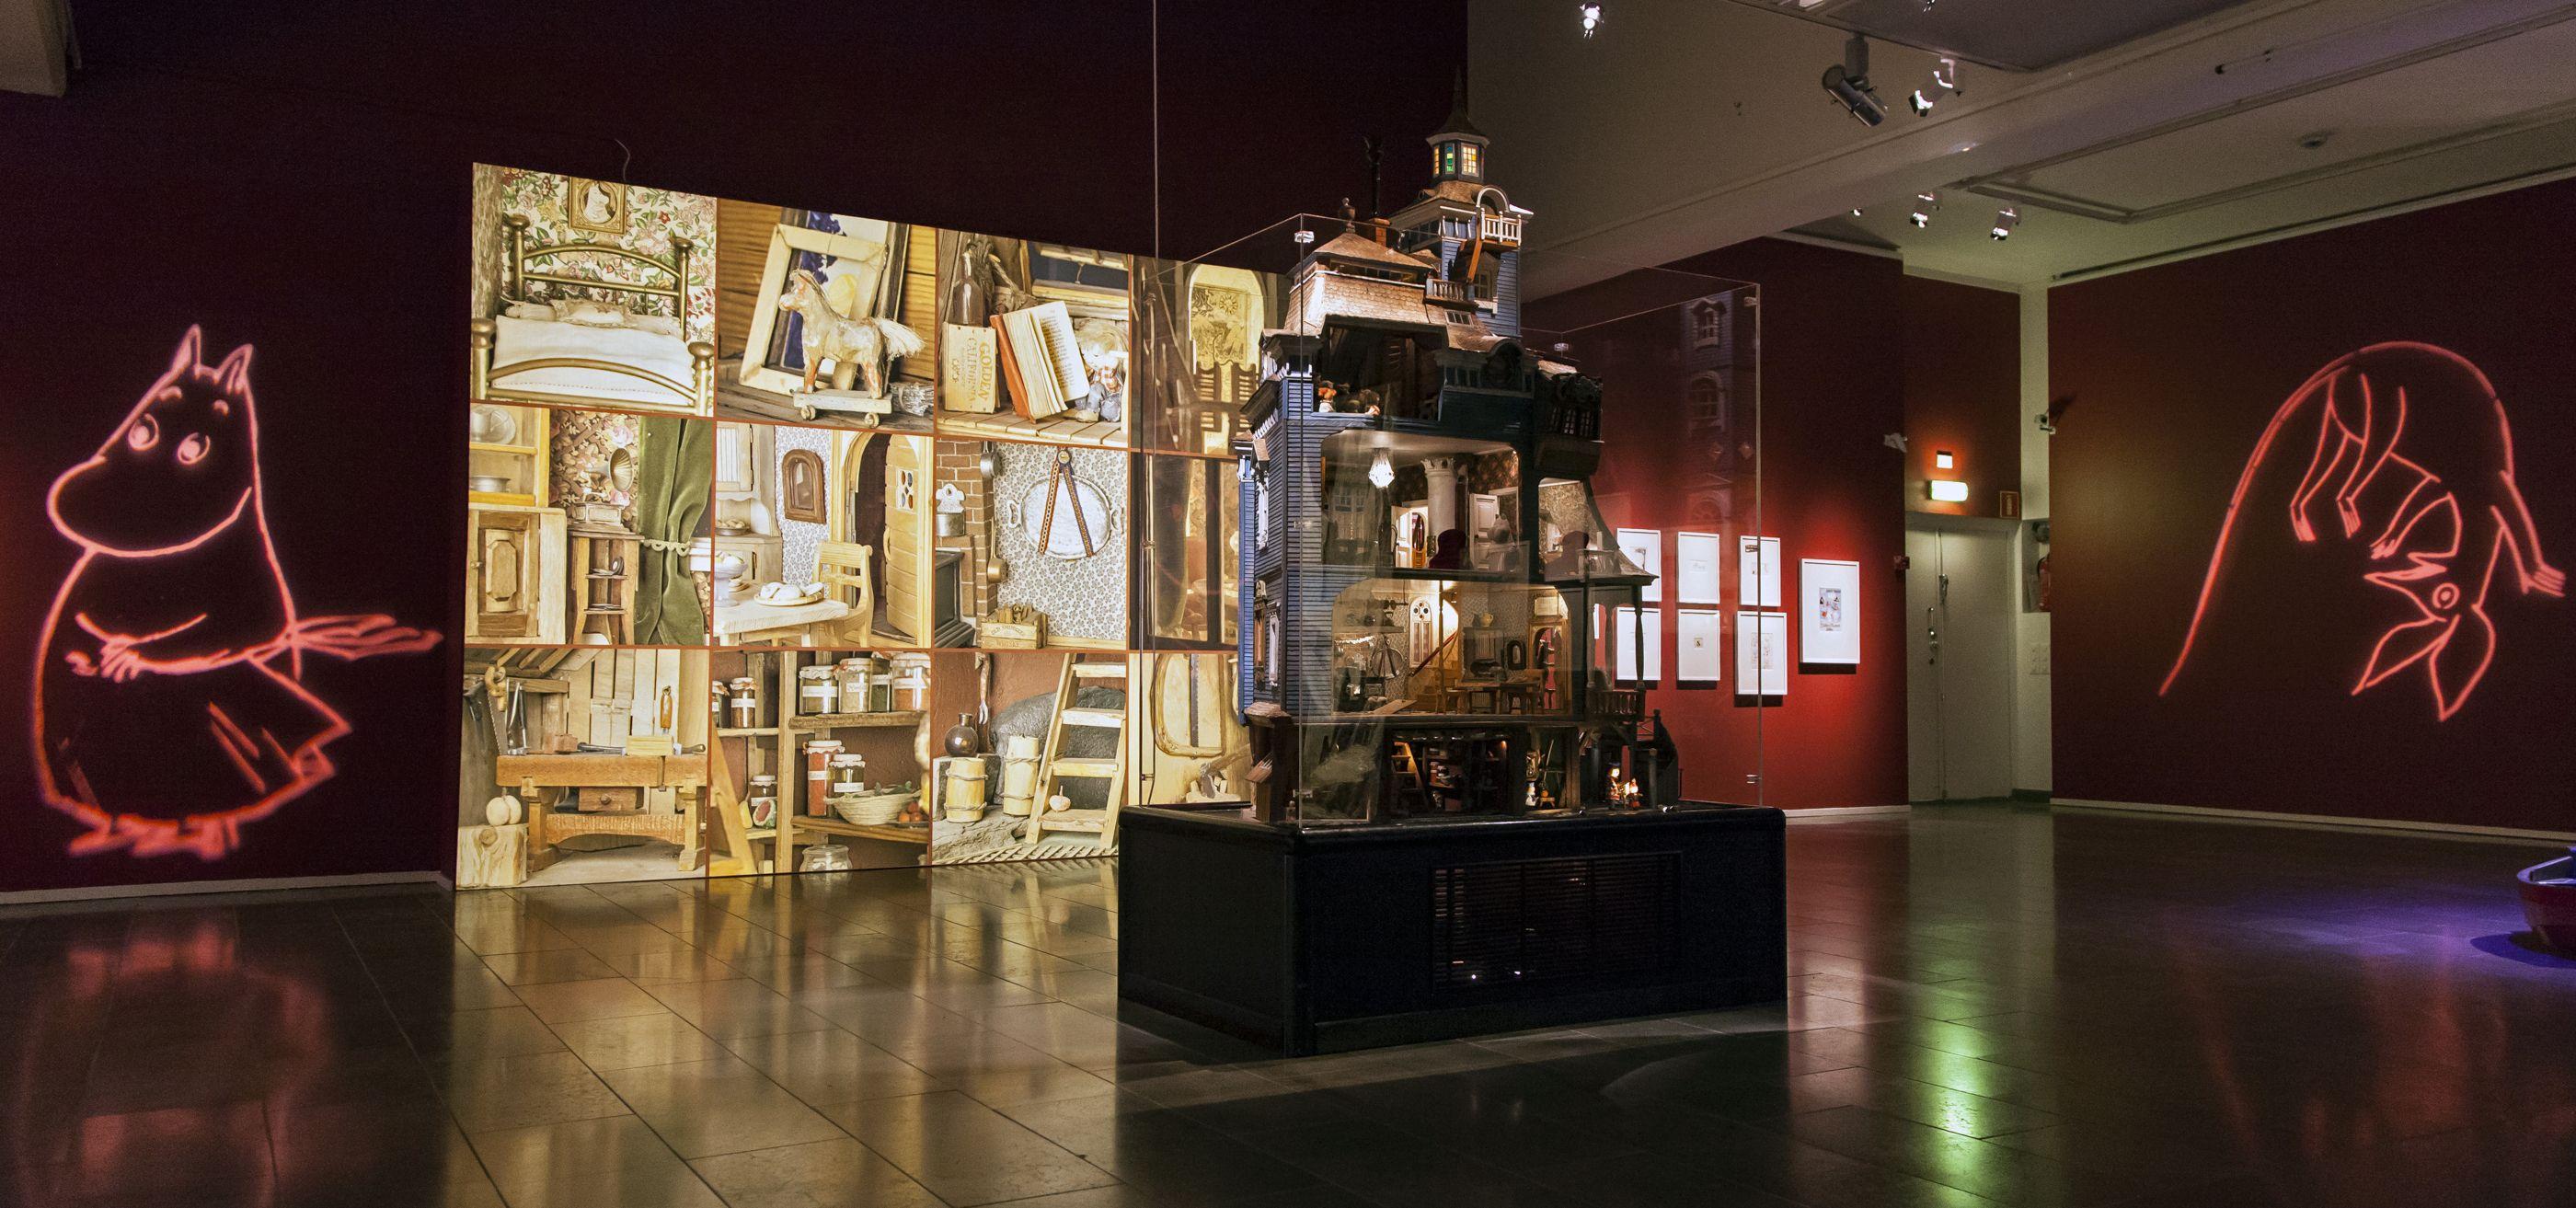 знаменитости музей муми троллей в тампере картинки можно